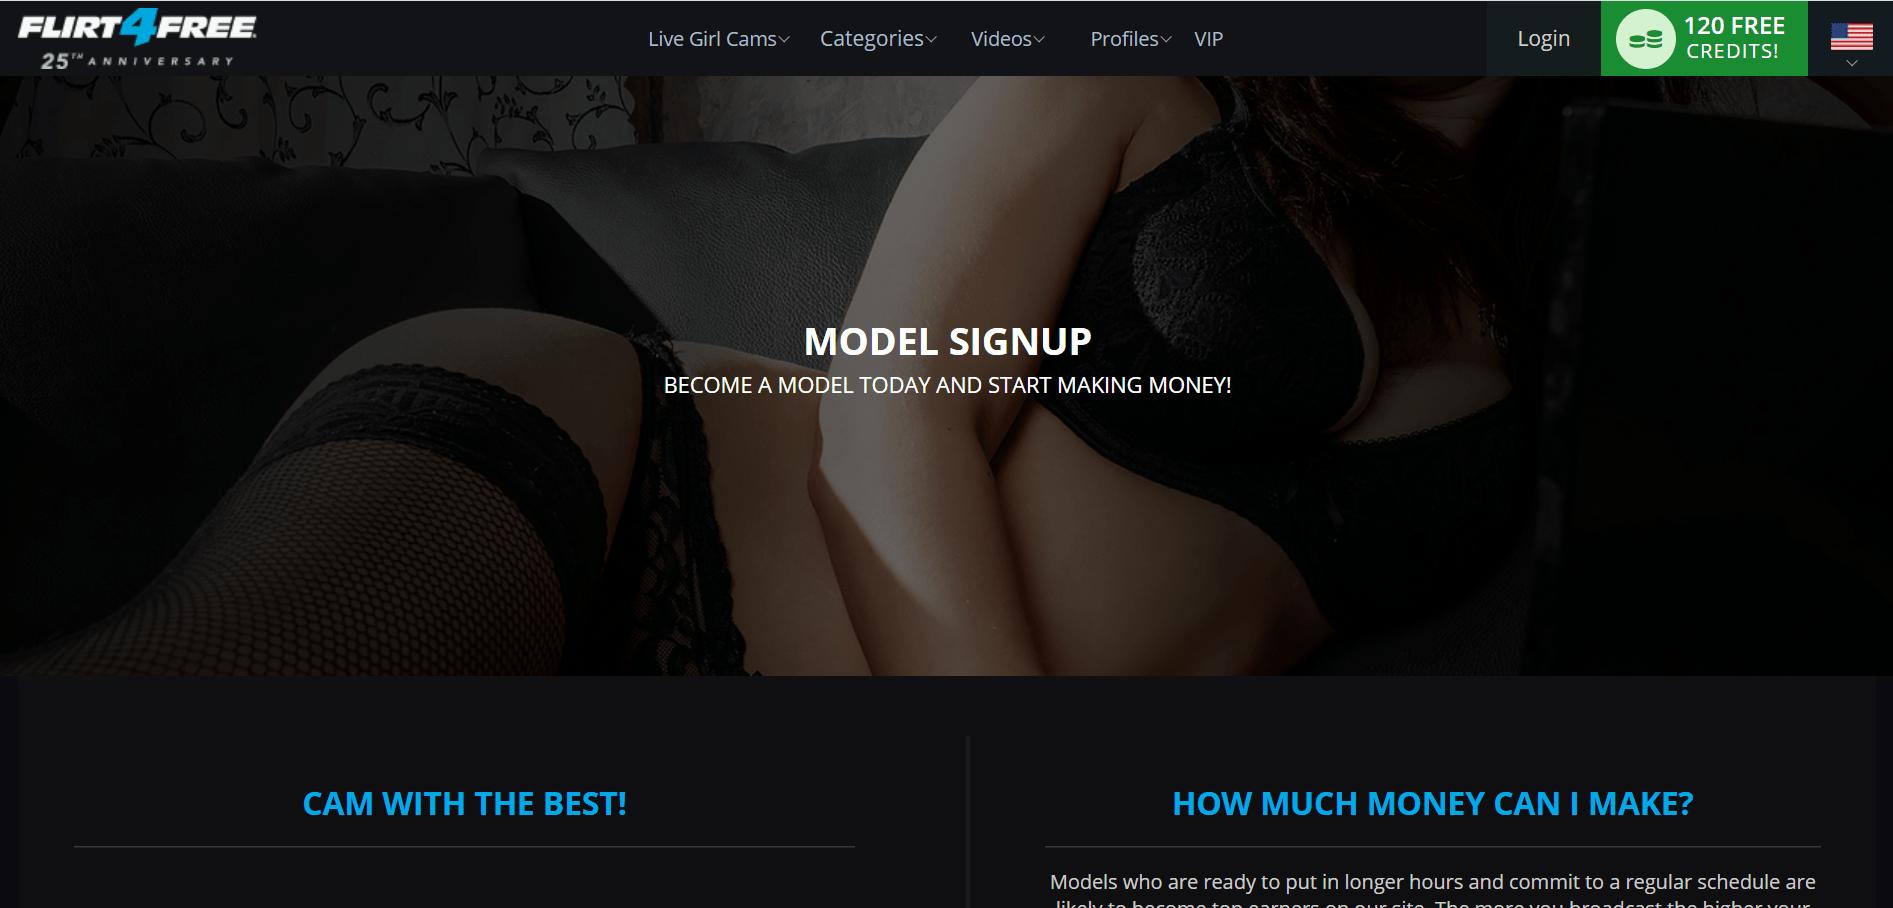 Вебкам сайт Flirt4Free